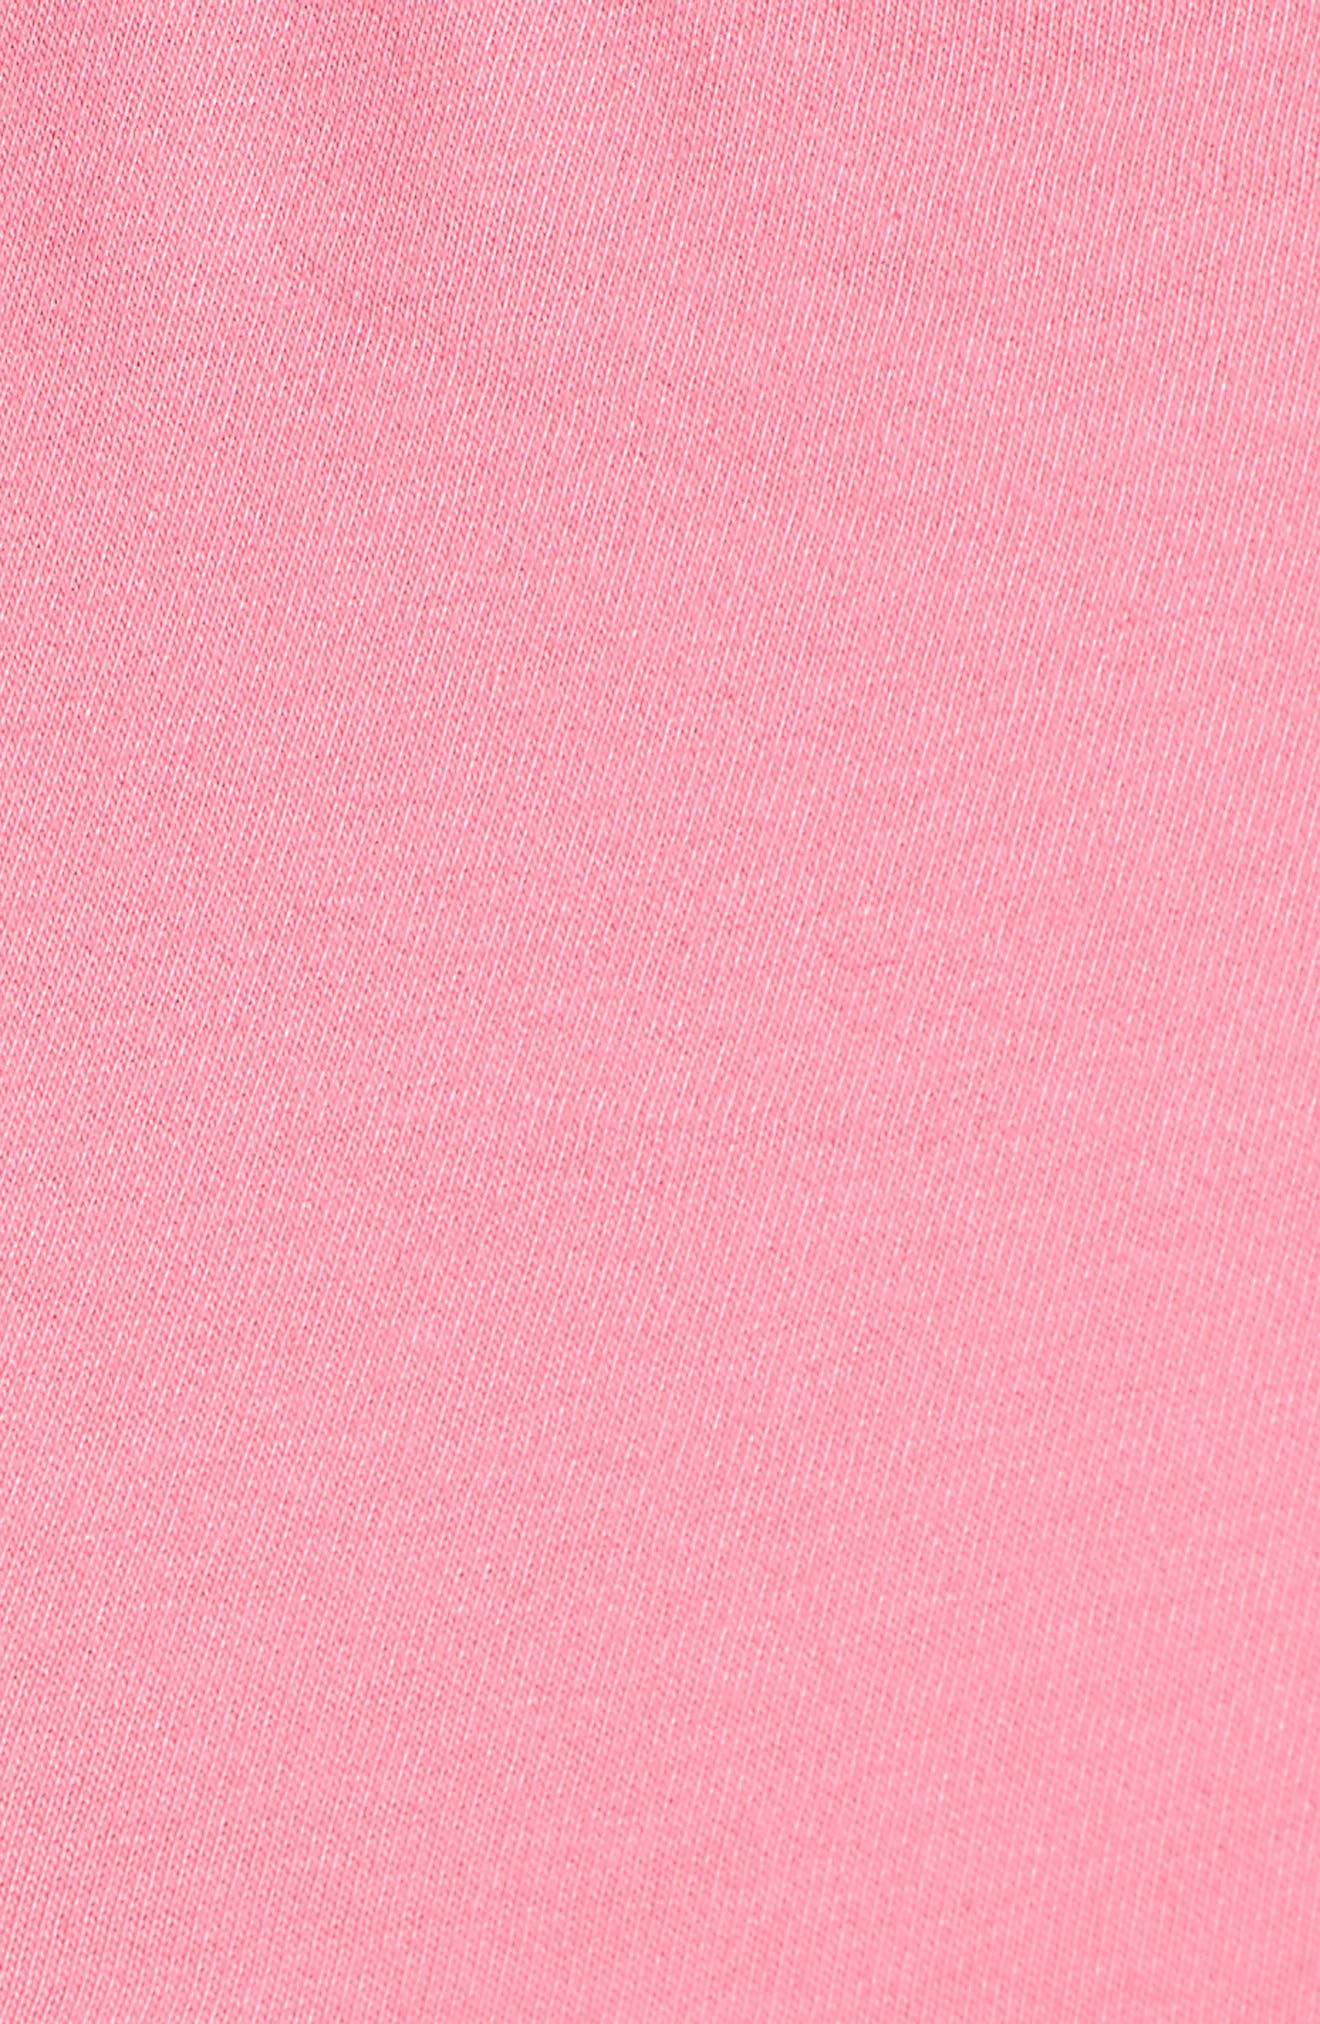 FENTY PUMA by Rihanna Crop Tee,                             Alternate thumbnail 6, color,                             690